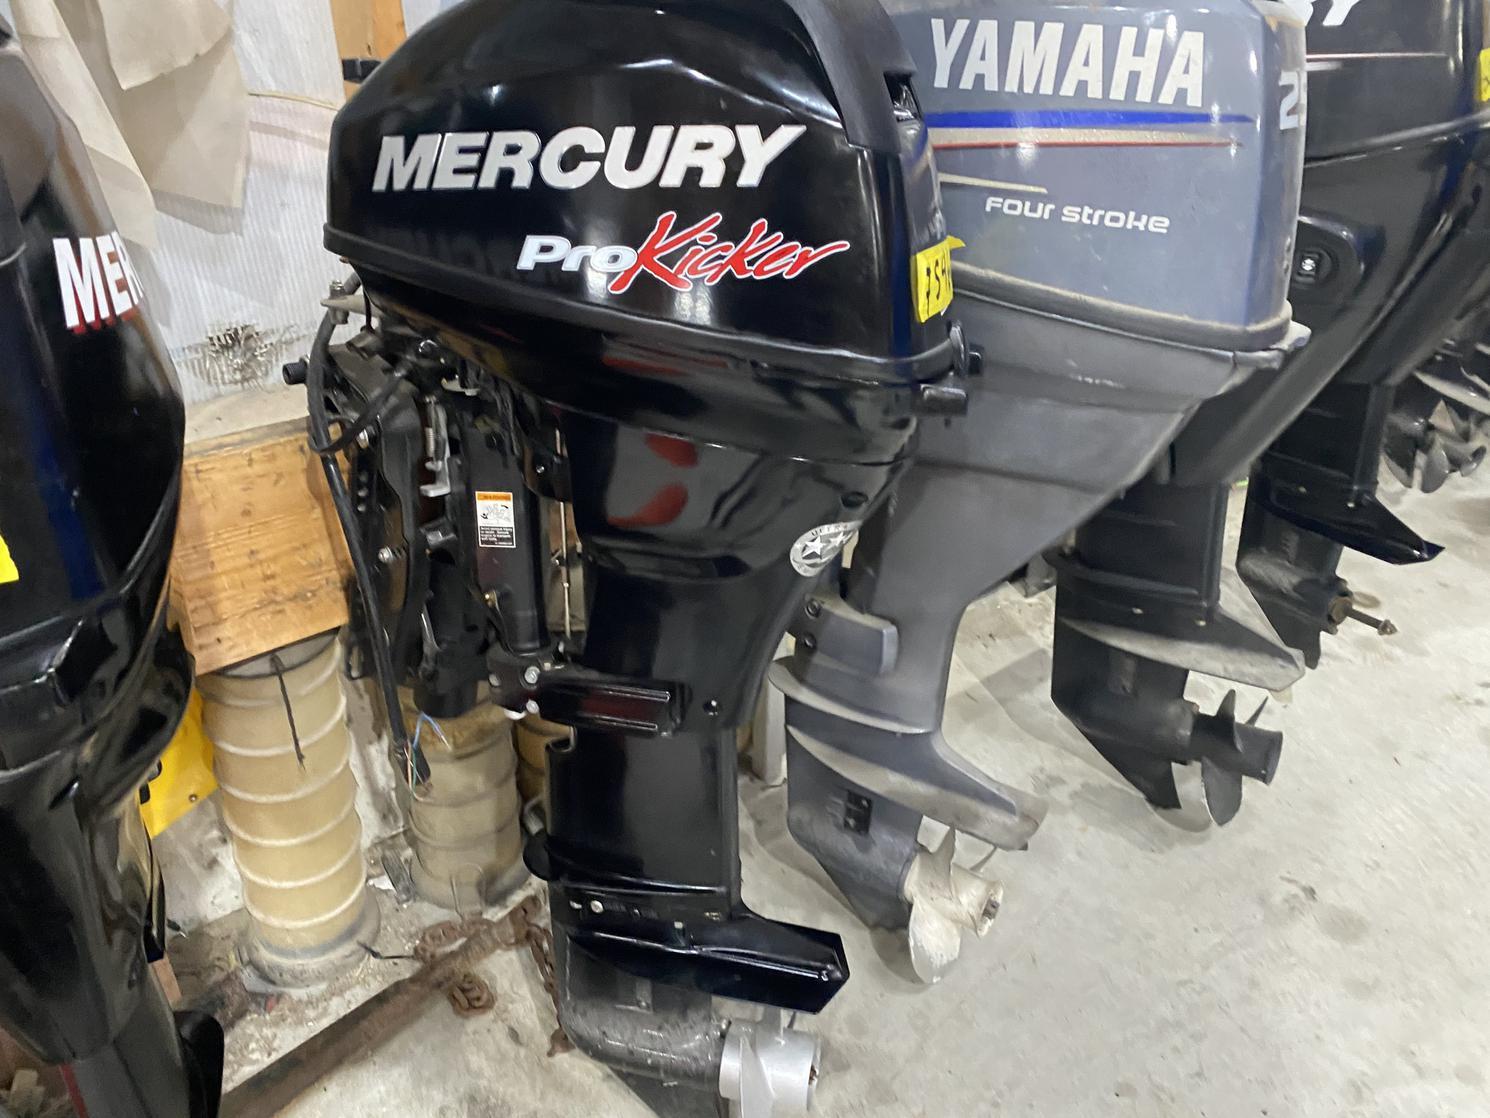 Mercury MERCURY 15 HP PRO KICKER 2018